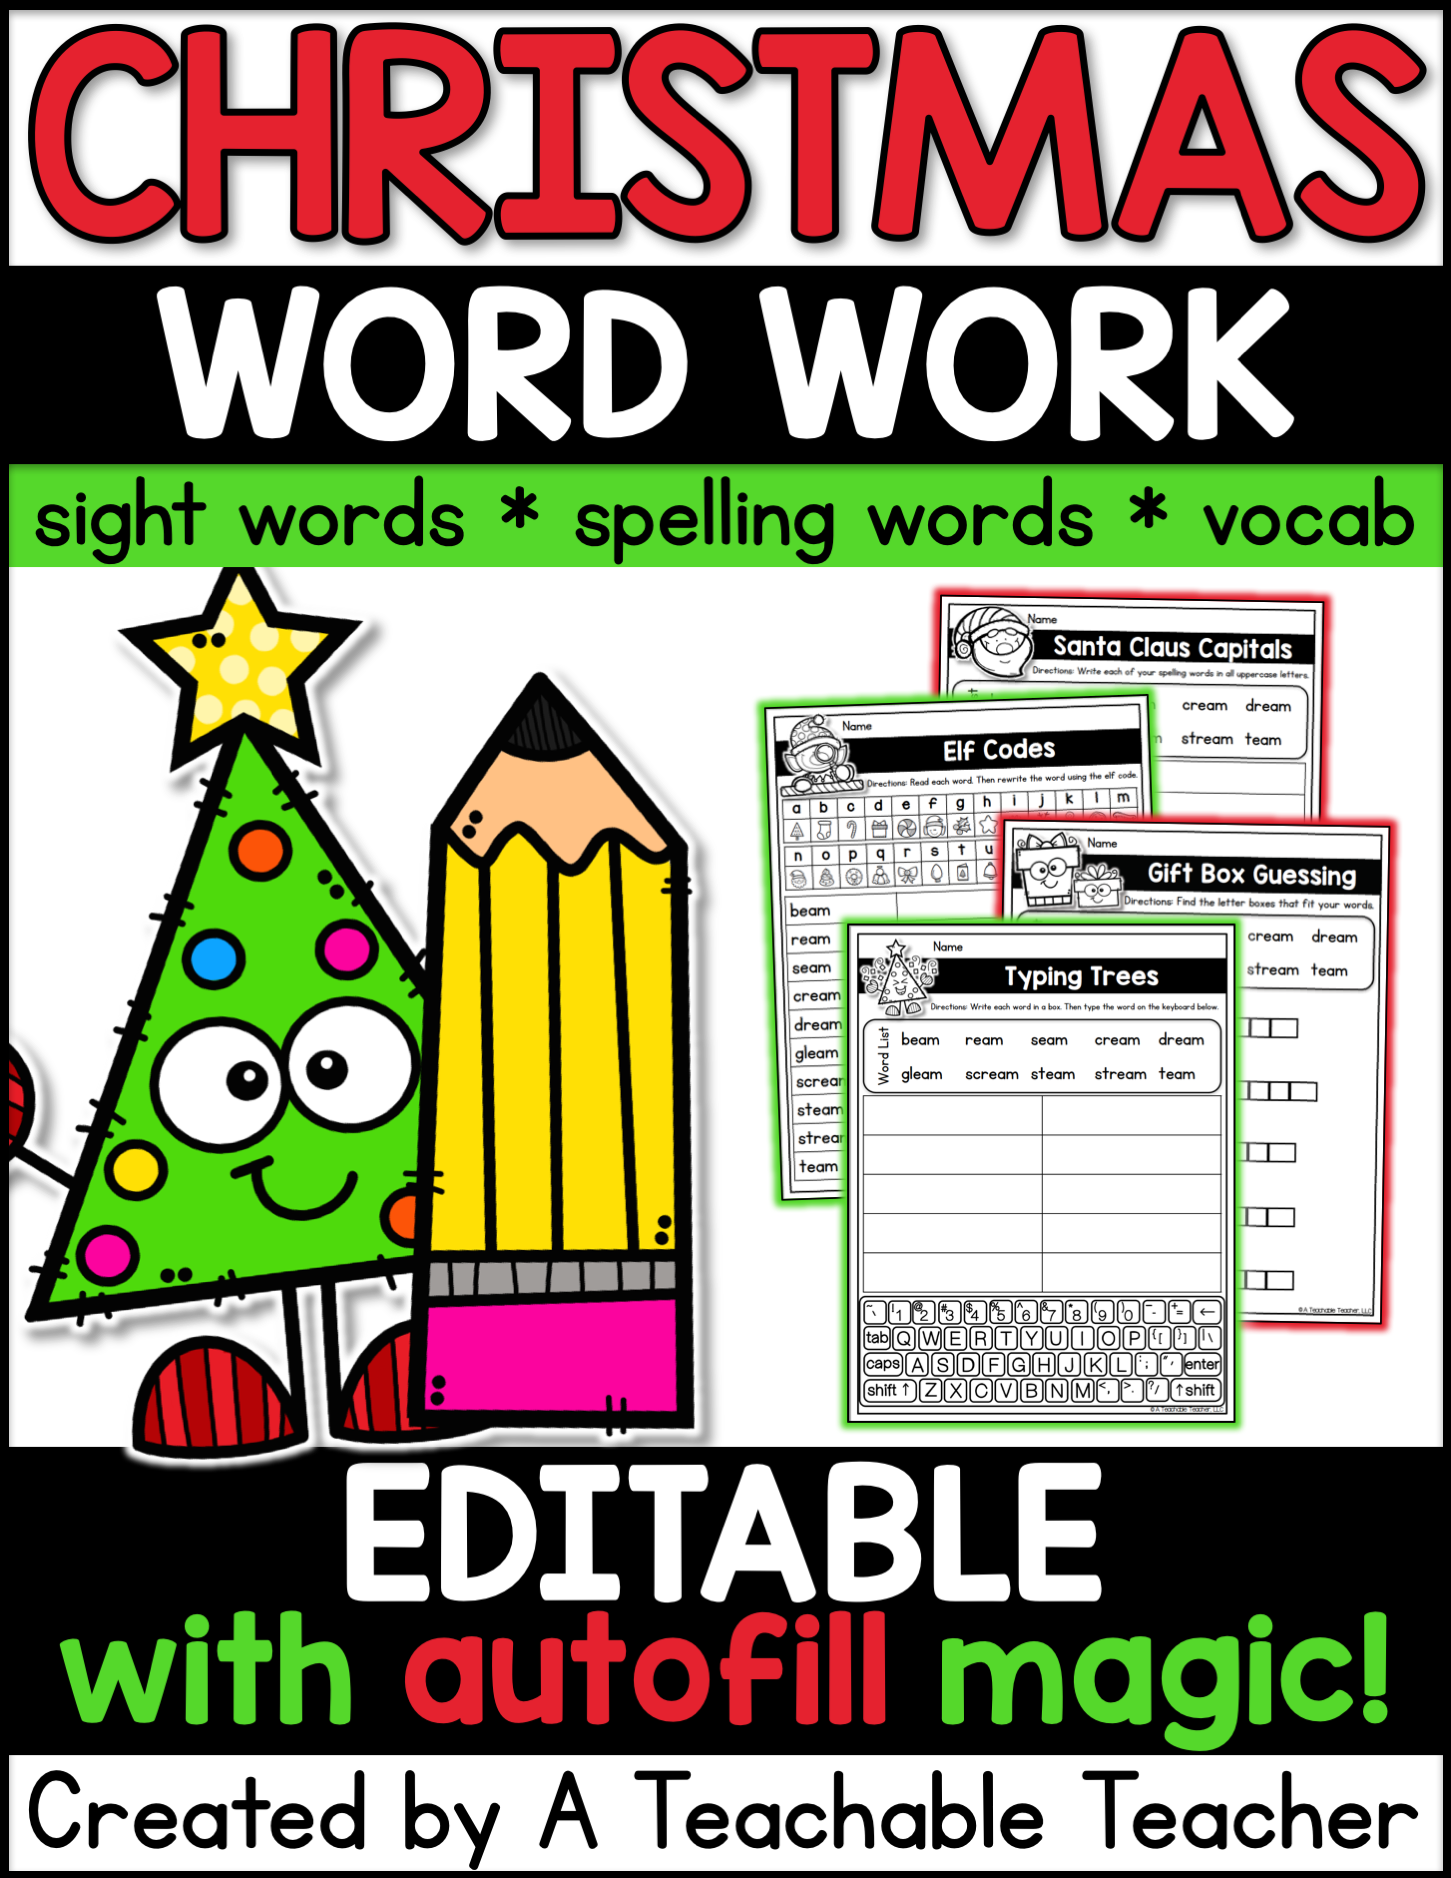 Editable Christmas Word Work - A